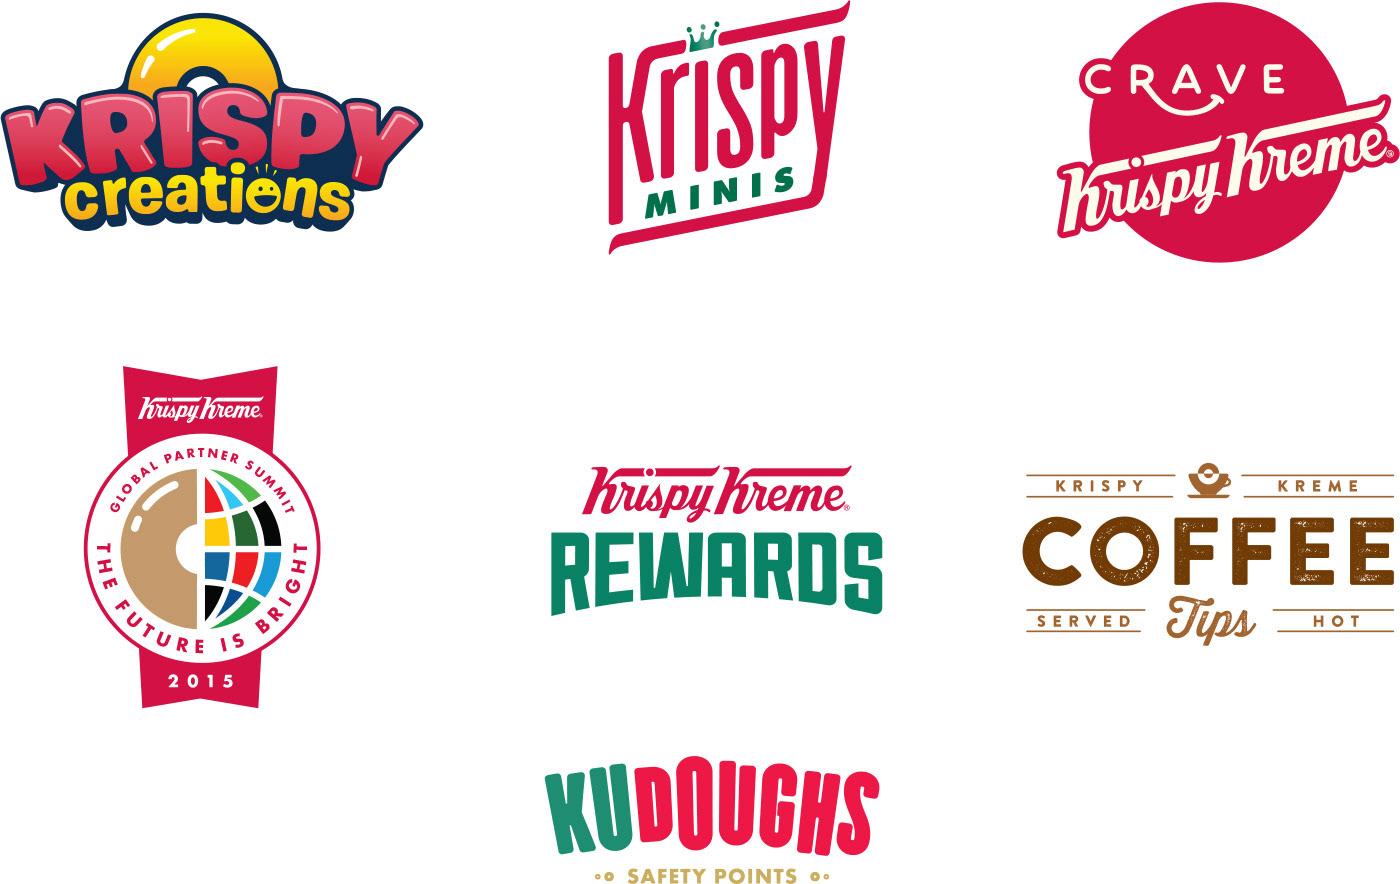 Keats Pierce - Krispy Kreme various logos